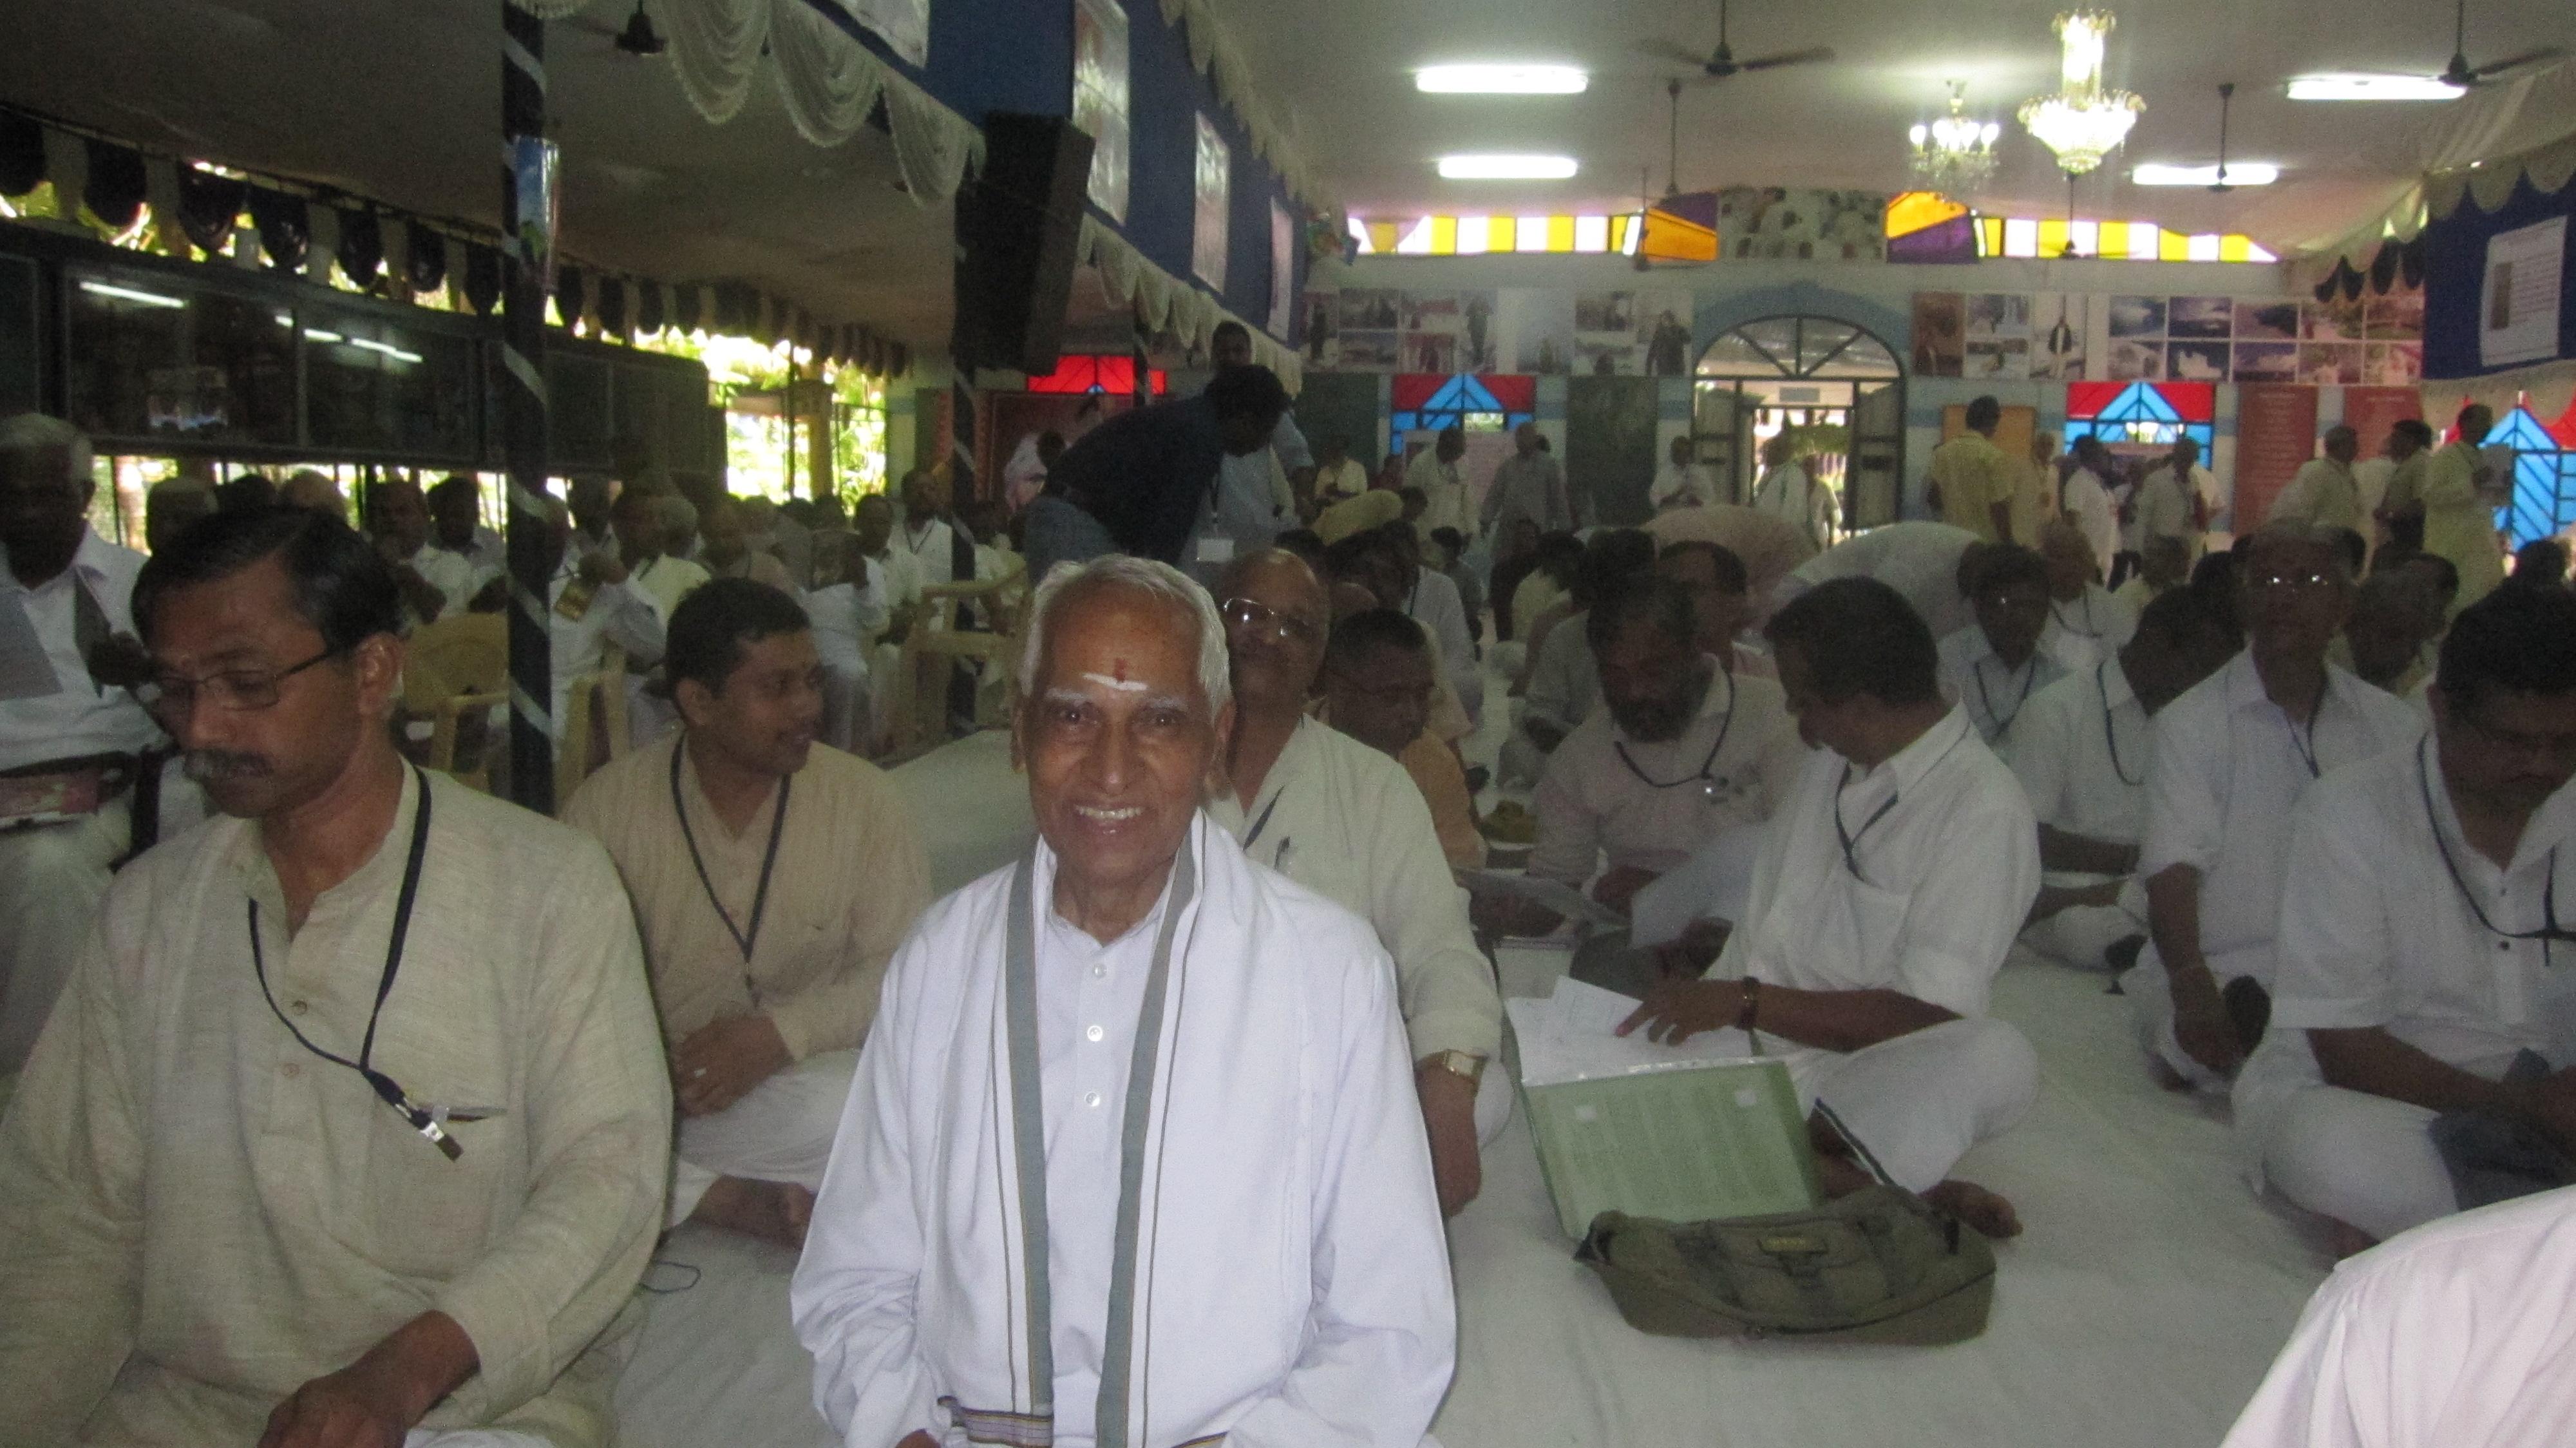 At-an-Akhil-Bharatiya-Baitak, Always-sits-on-floor-NOT-ON-CHAIR